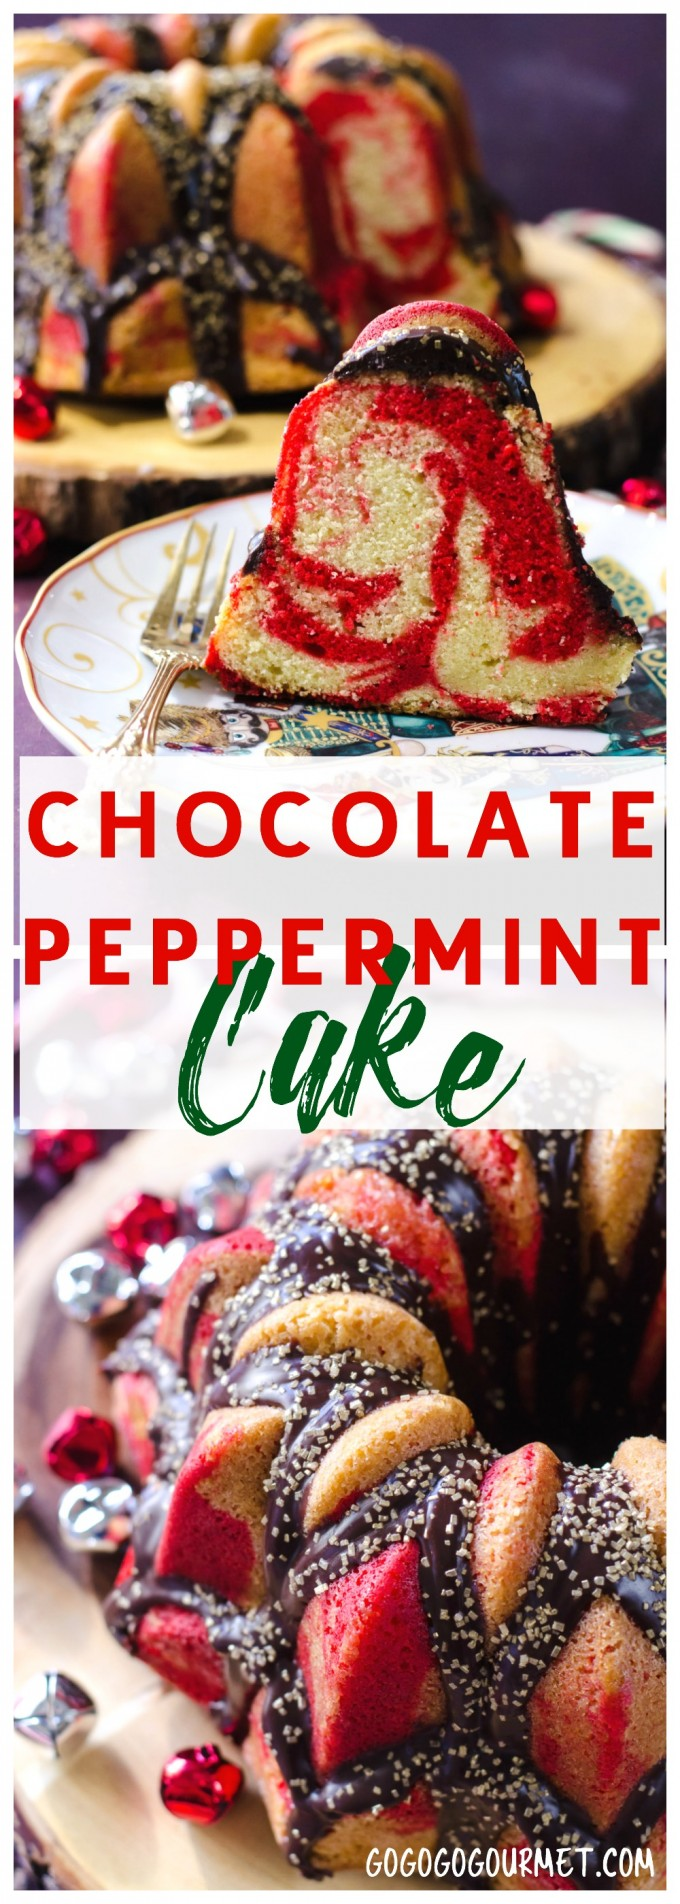 Chocolate Glazed Peppermint Cake Go Go Go Gourmet